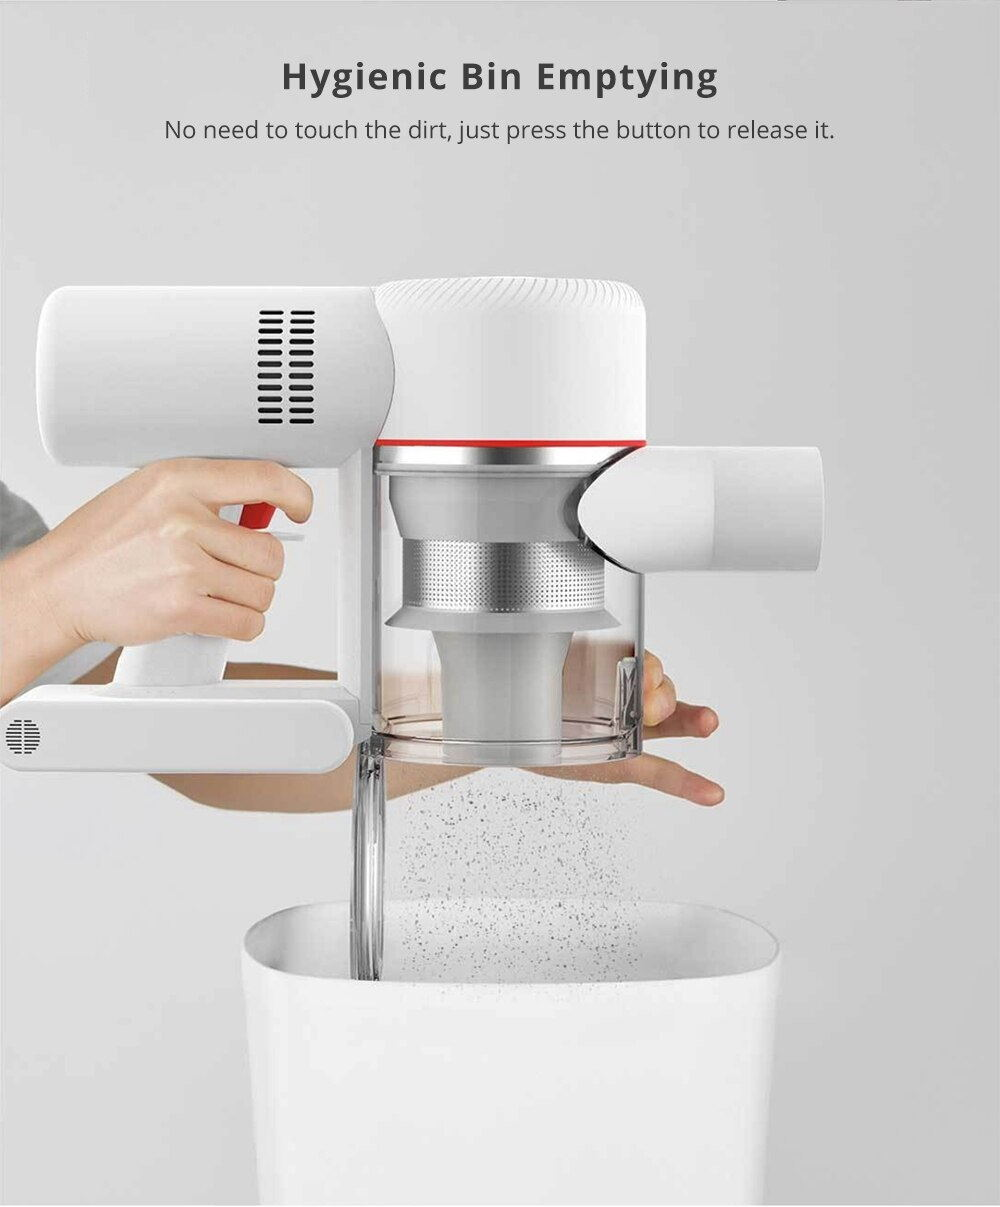 xiaomi dreame v9 wireless vacuum cleaner